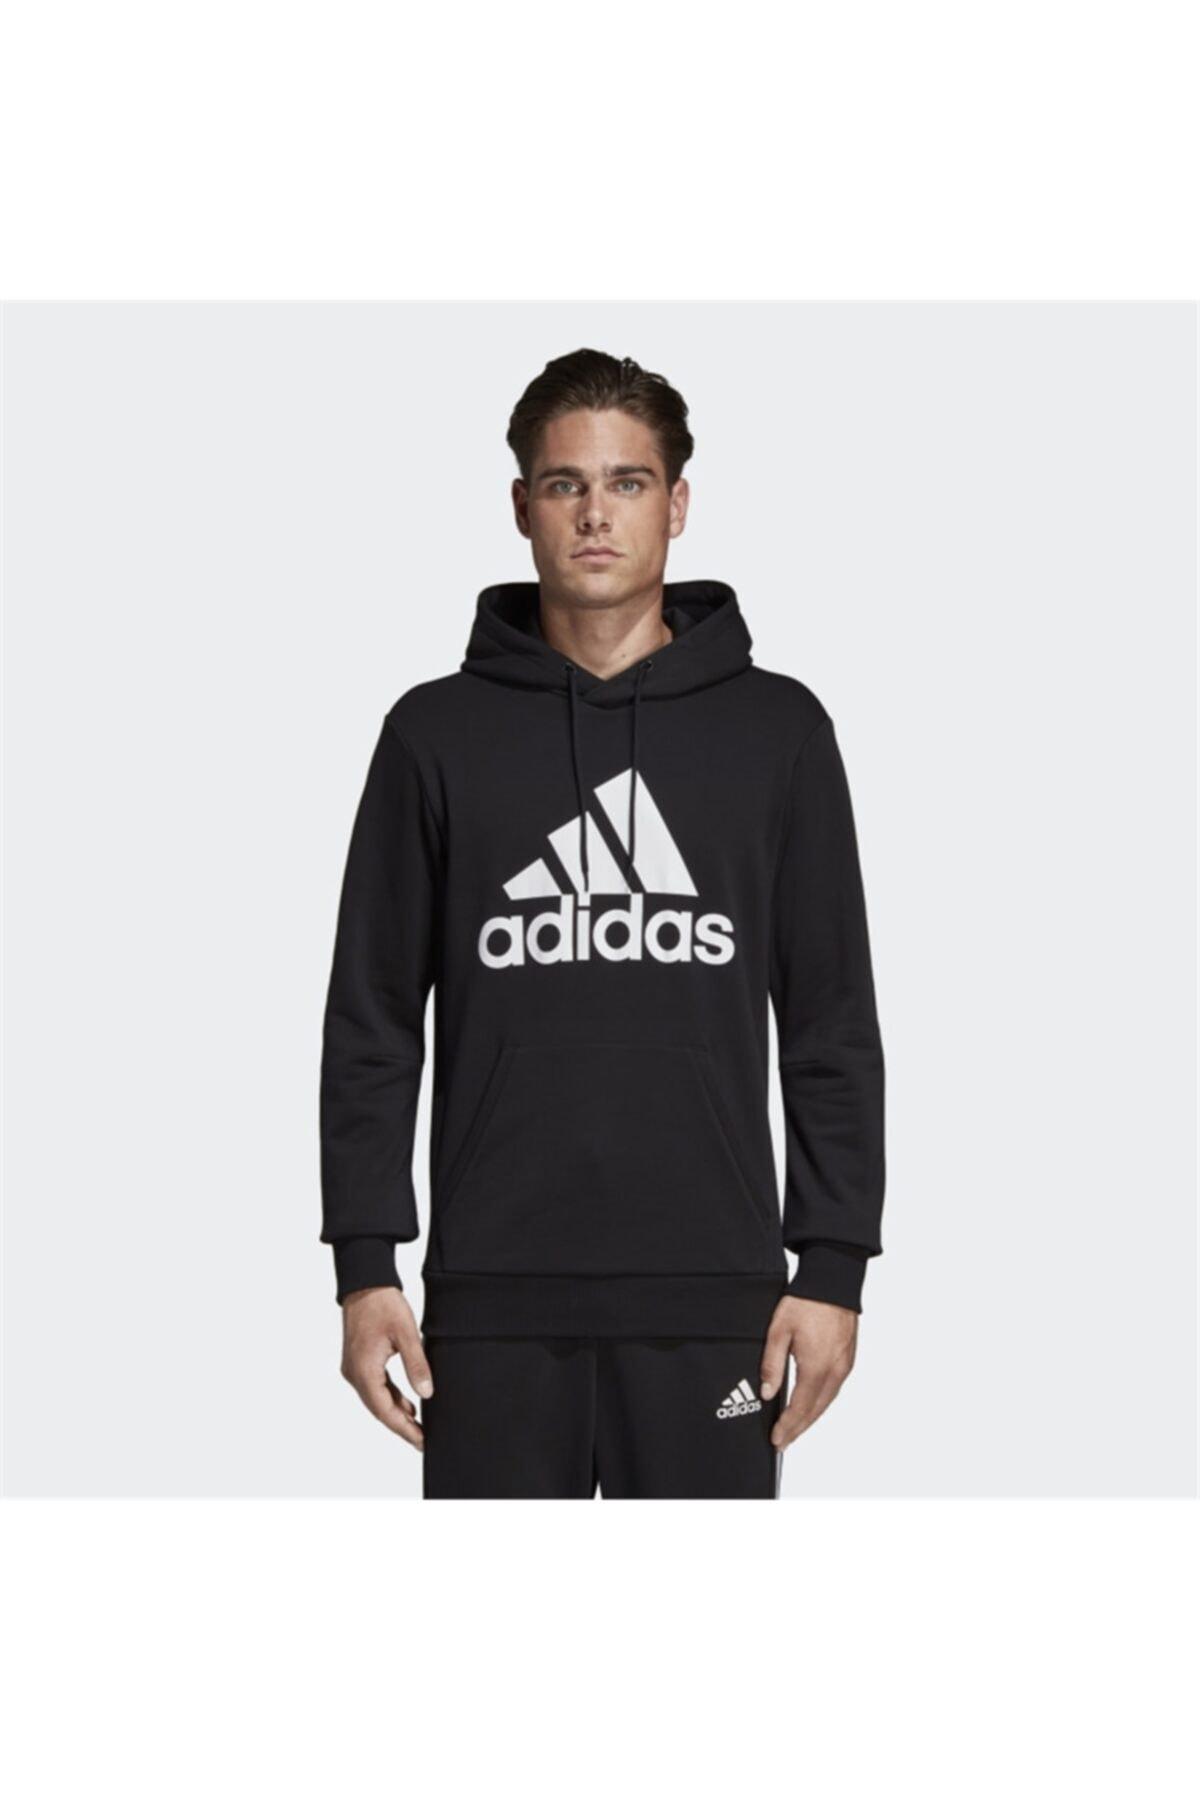 adidas MH BOS PO FT Erkek Sweatshirt 1